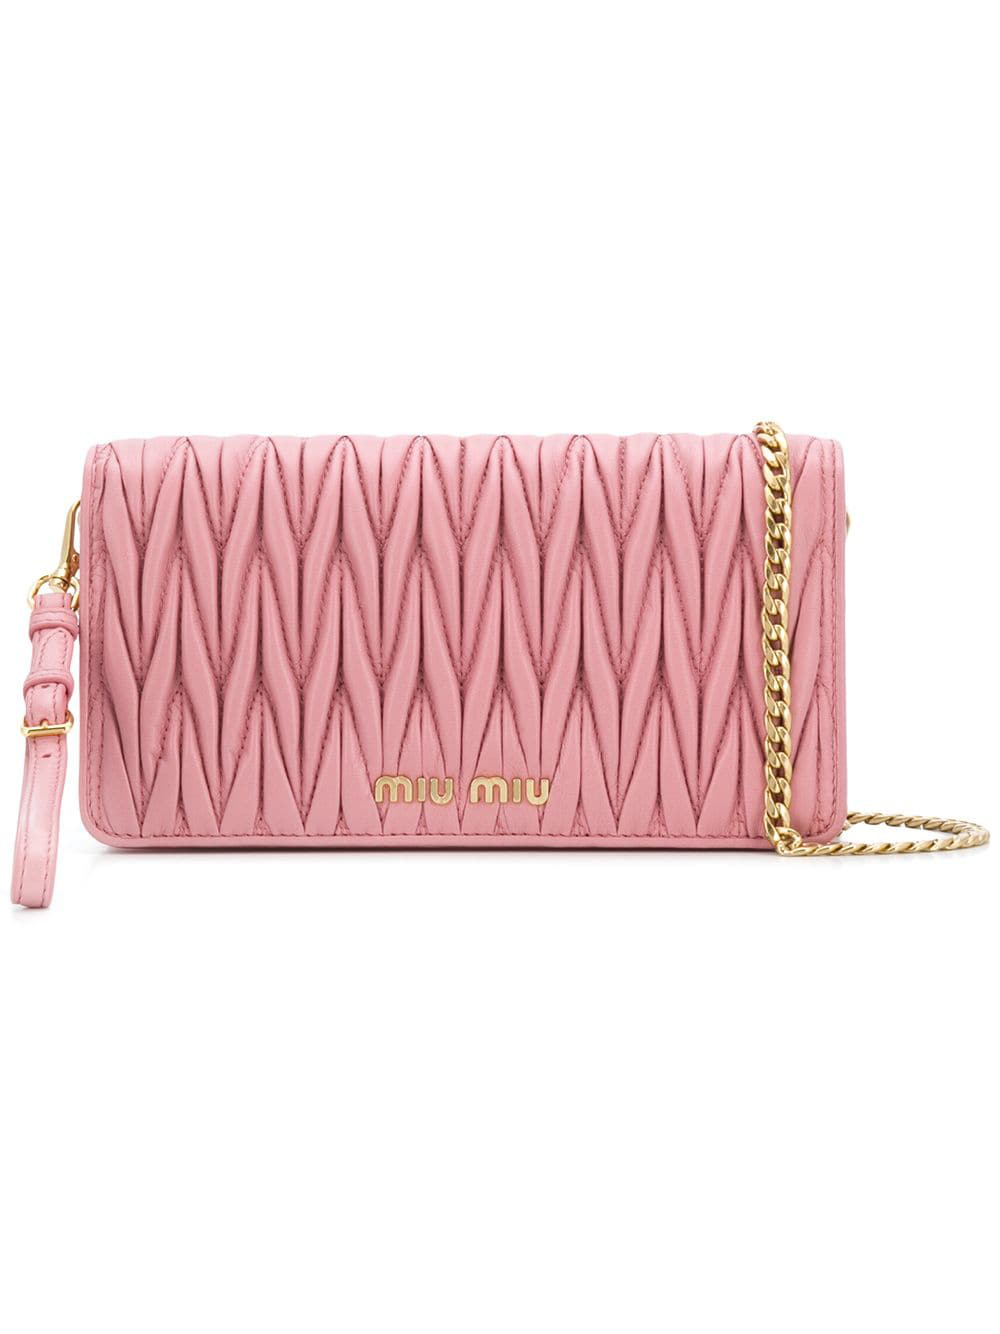 7cc1d3eba52a Miu Miu MatelassÉ Clutch Bag In Pink